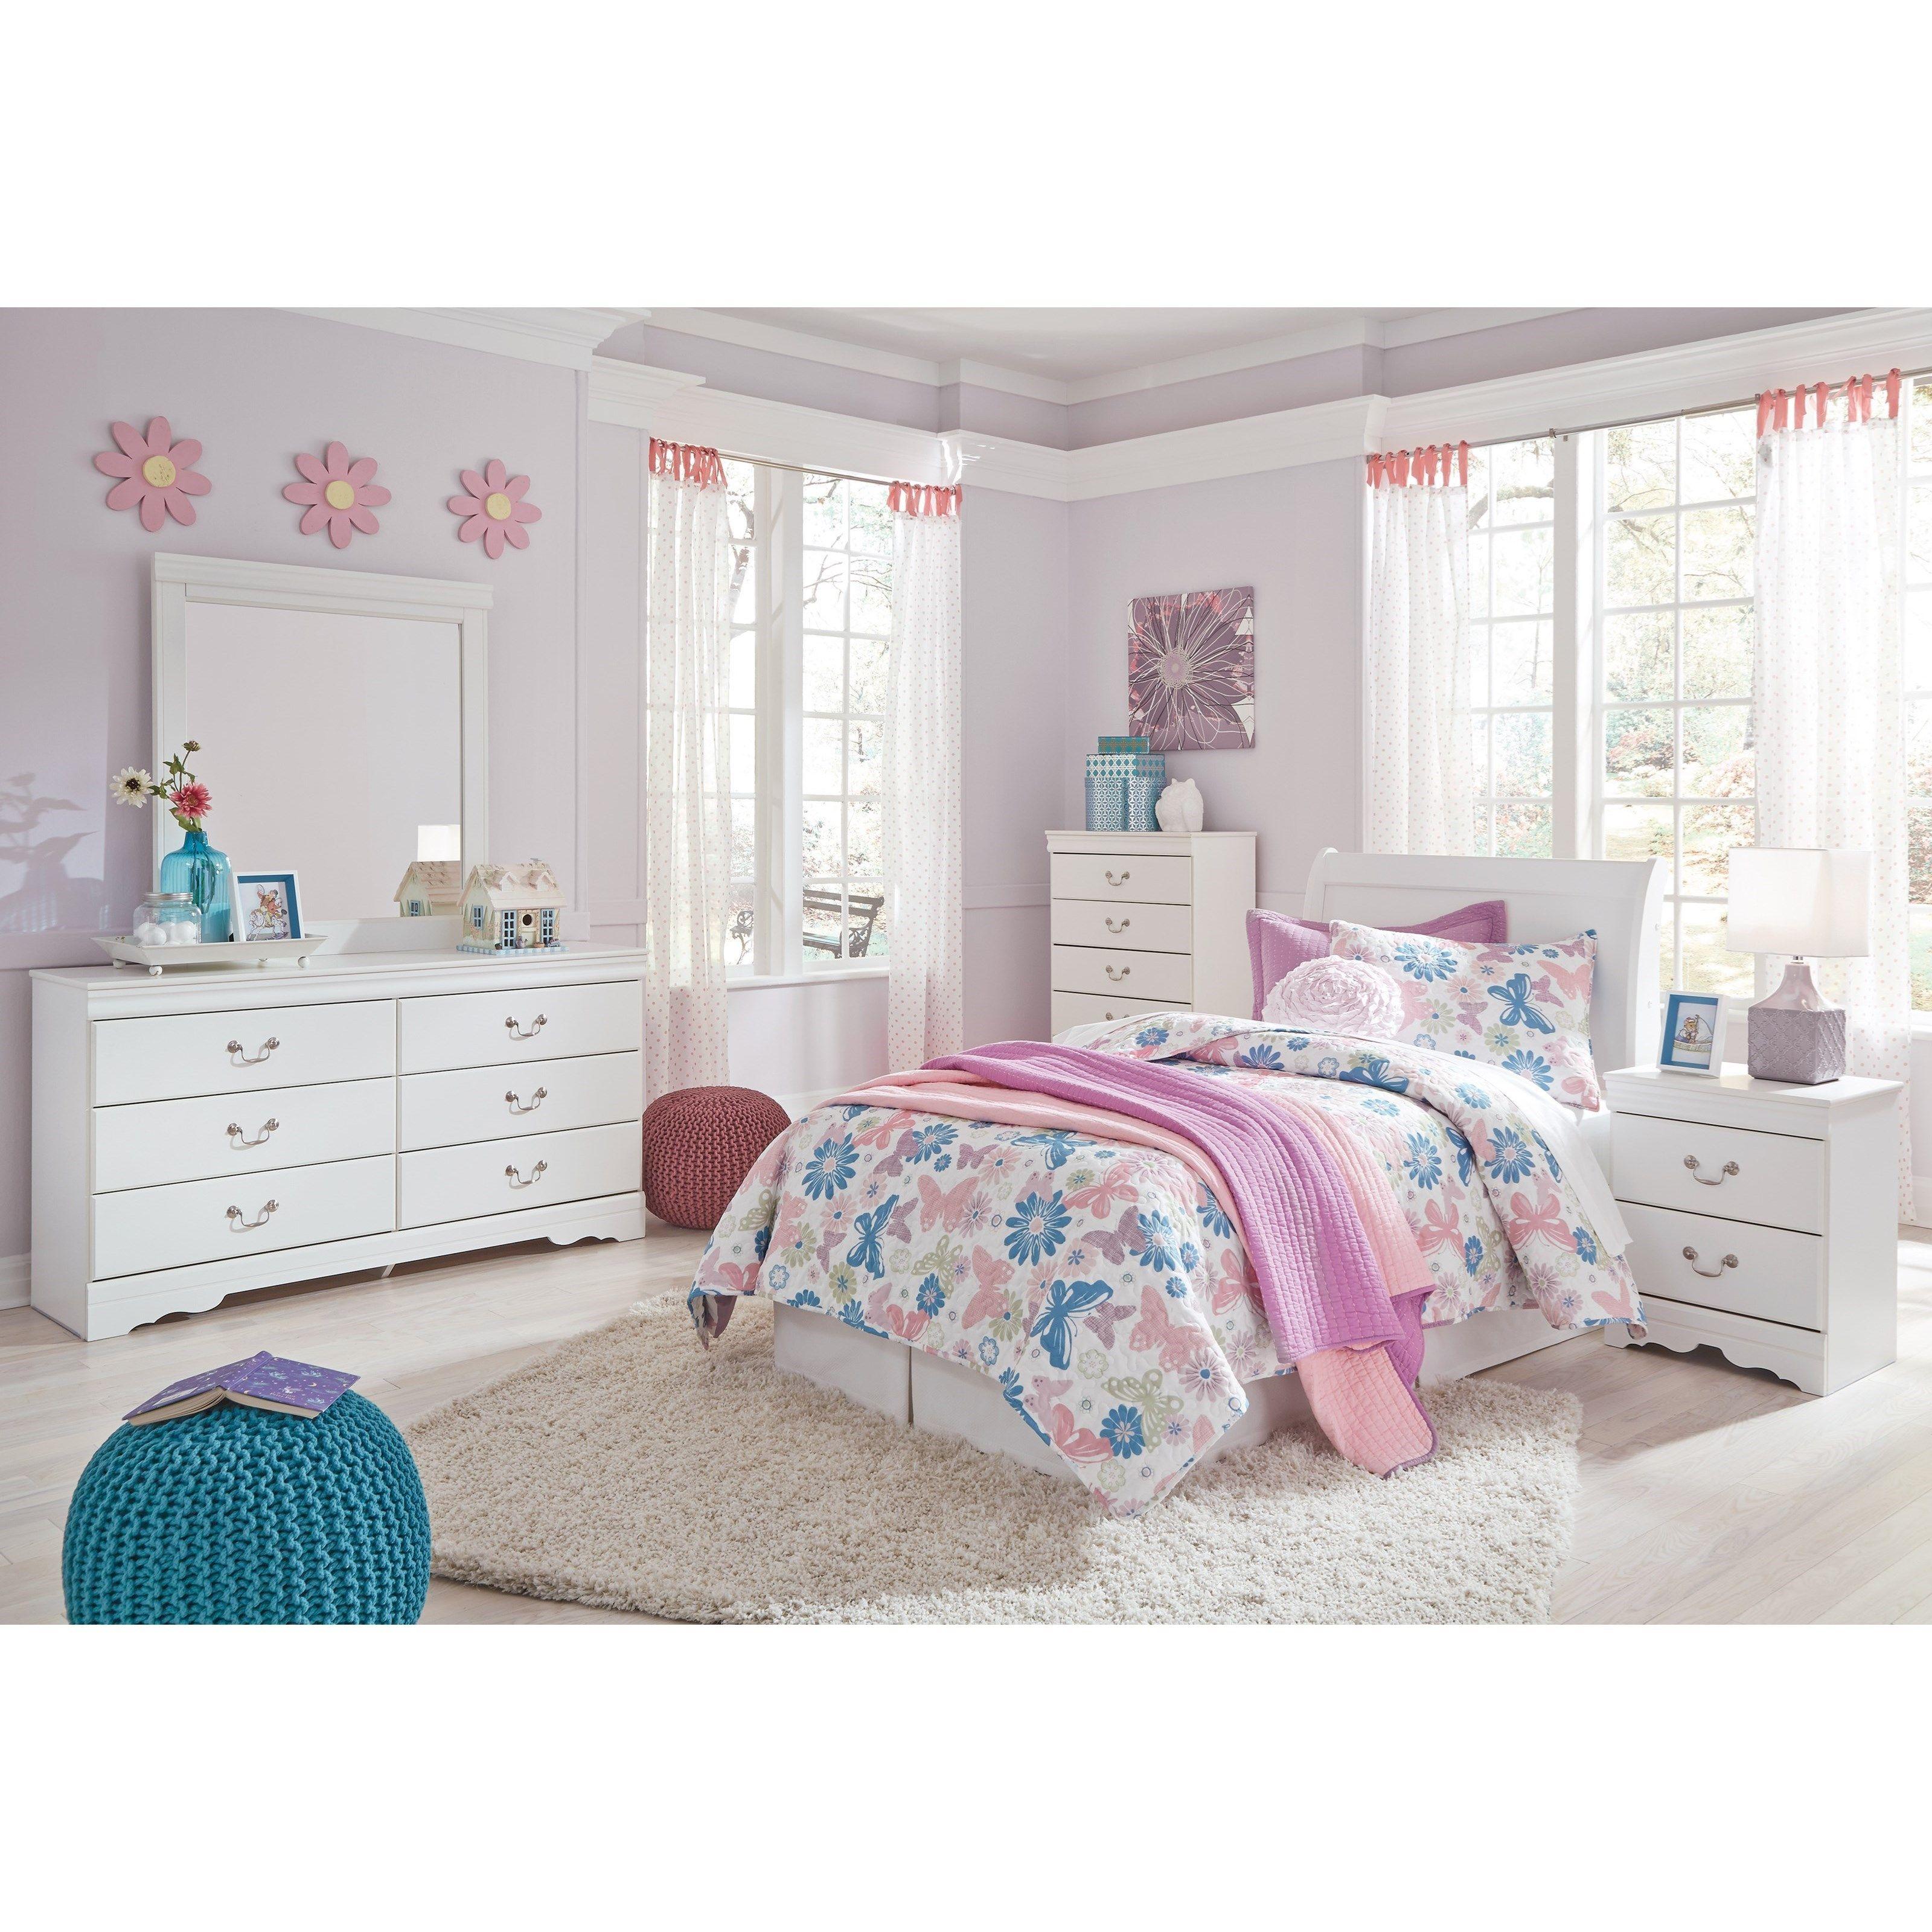 Best Anarasia Twin Bedroom Group By Ashley Signature Design Bedroom Sets Bedroom Decor Bed Furniture 400 x 300